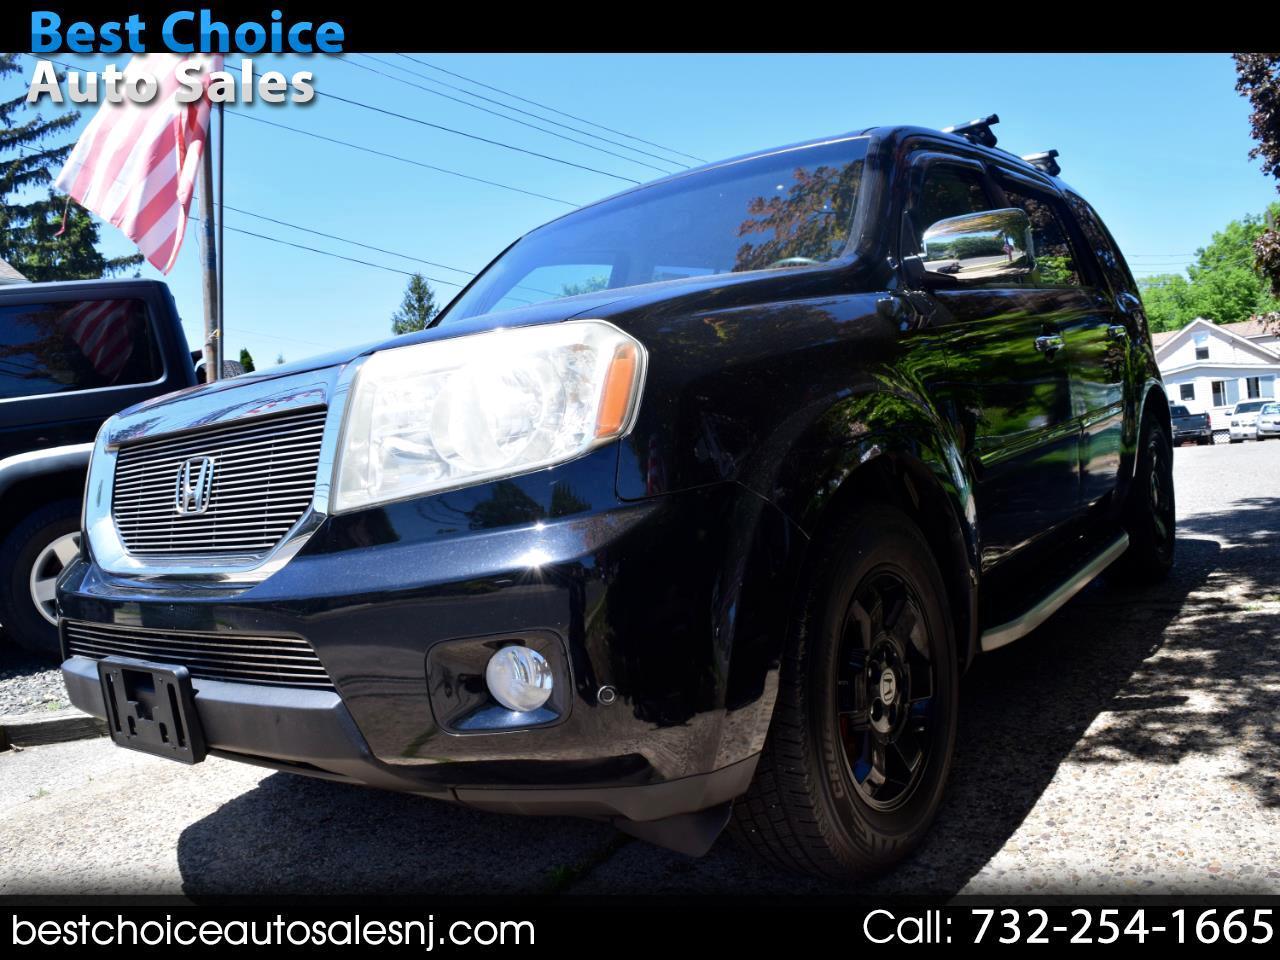 2009 Honda Pilot 4WD 4dr Touring w/RES & Navi